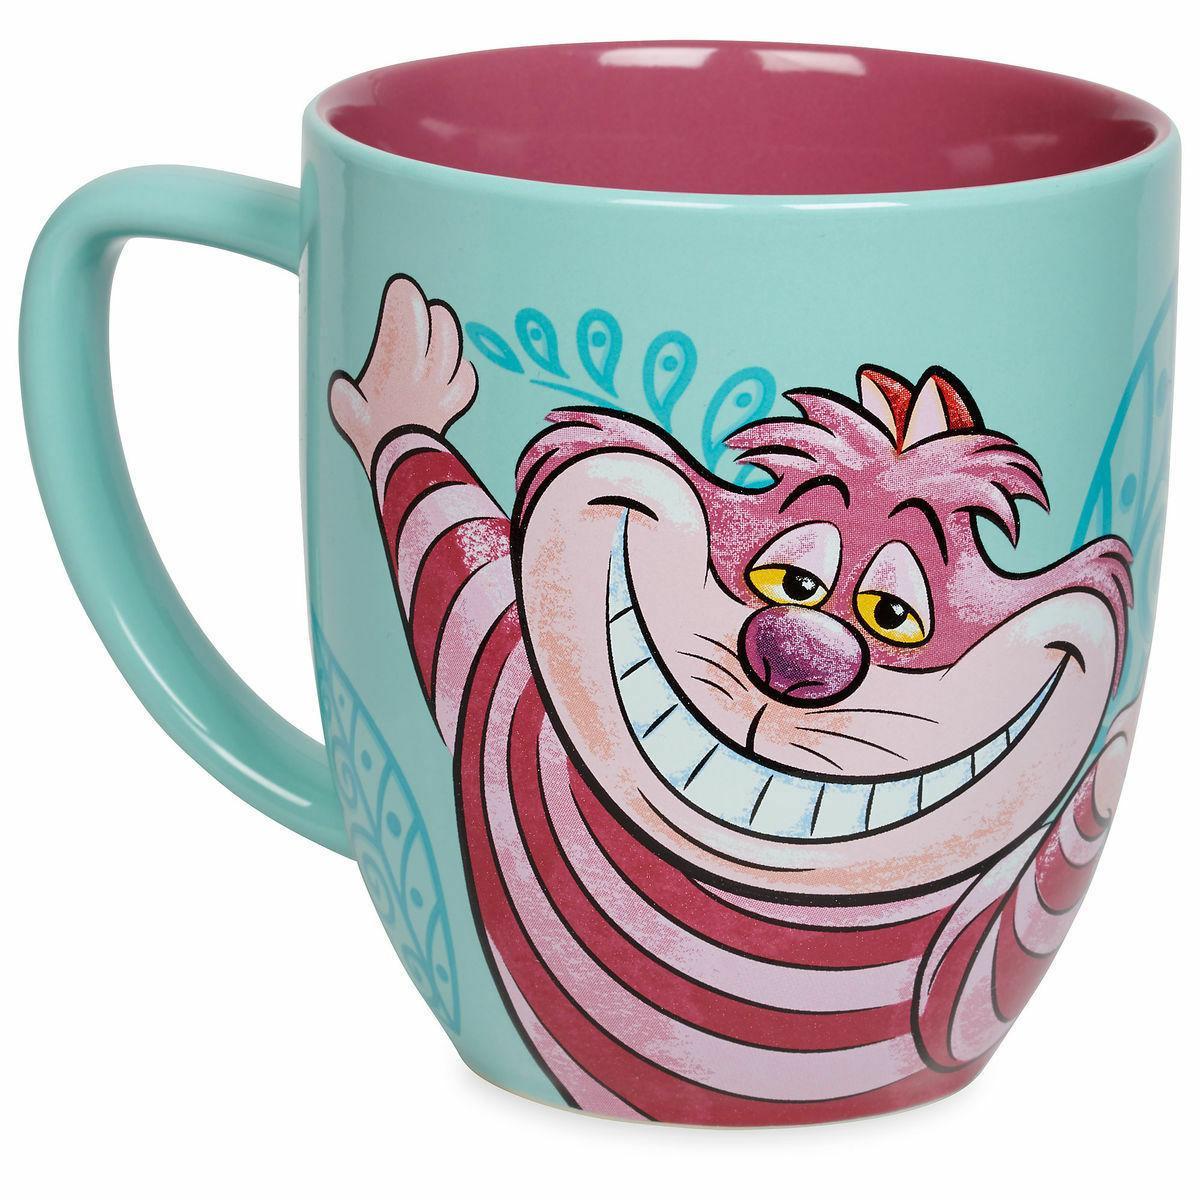 Disney Cheshire Cat Portrait Ceramic Coffee Mug 12 oz